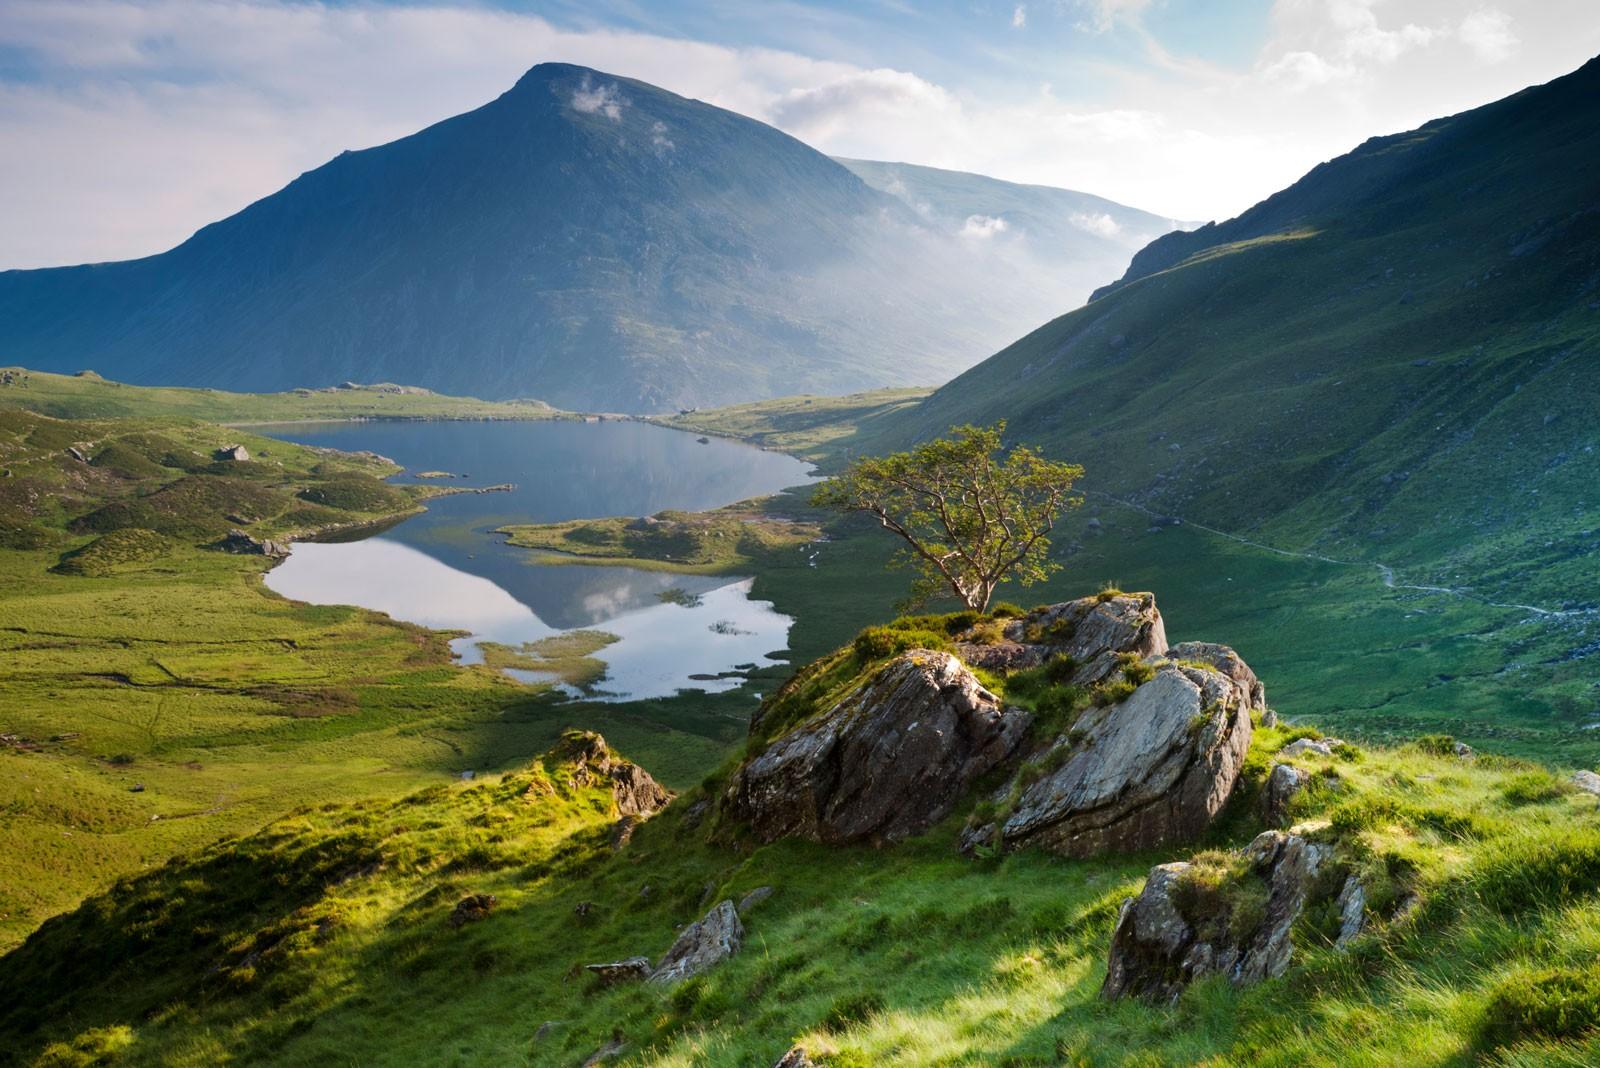 Snowdonia-National-Park-47c7a36